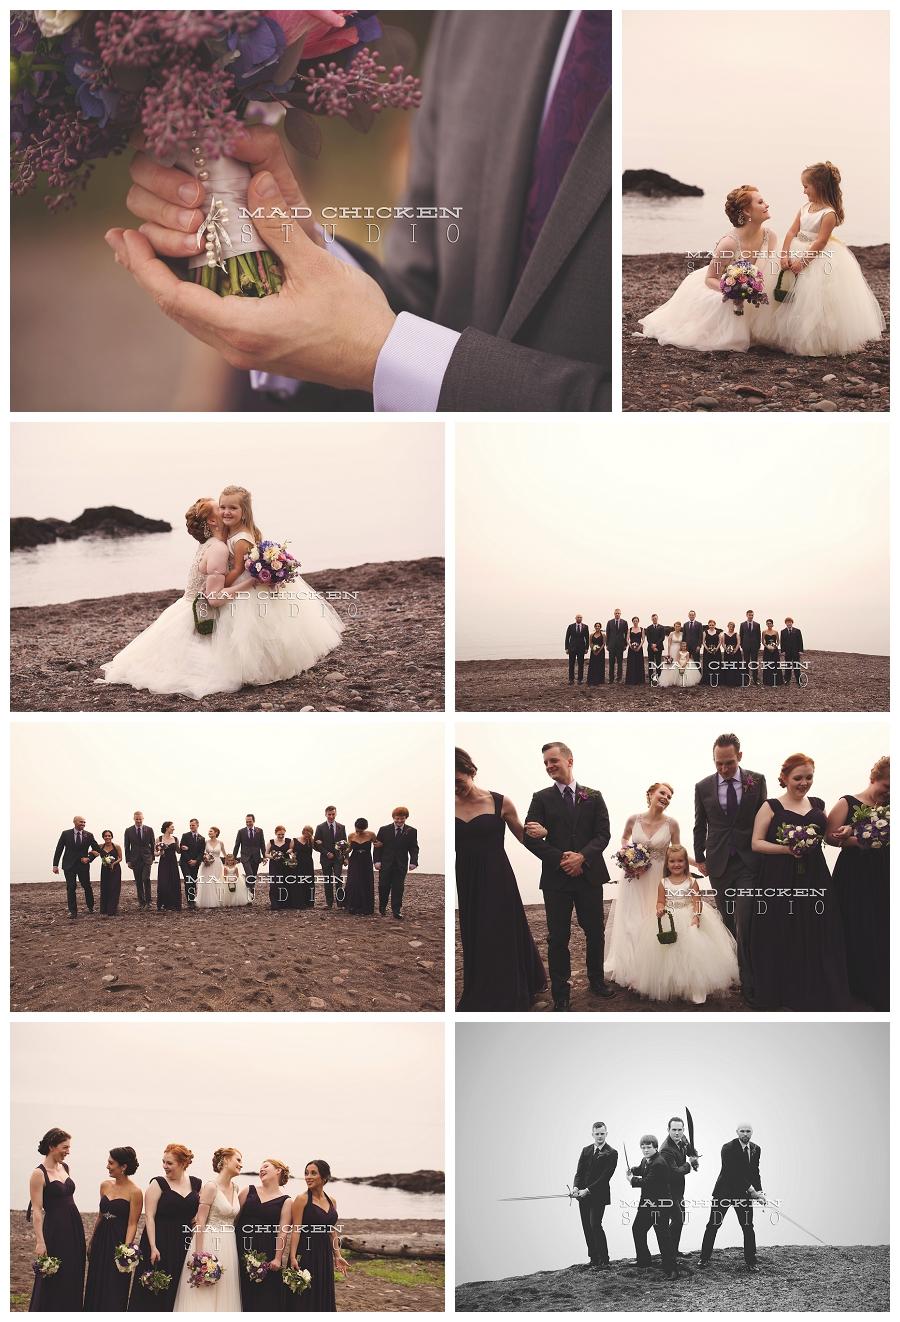 21 duluth wedding photographer mad chicken studio photographing wedding party on lake superior at lutsen resort.jpg